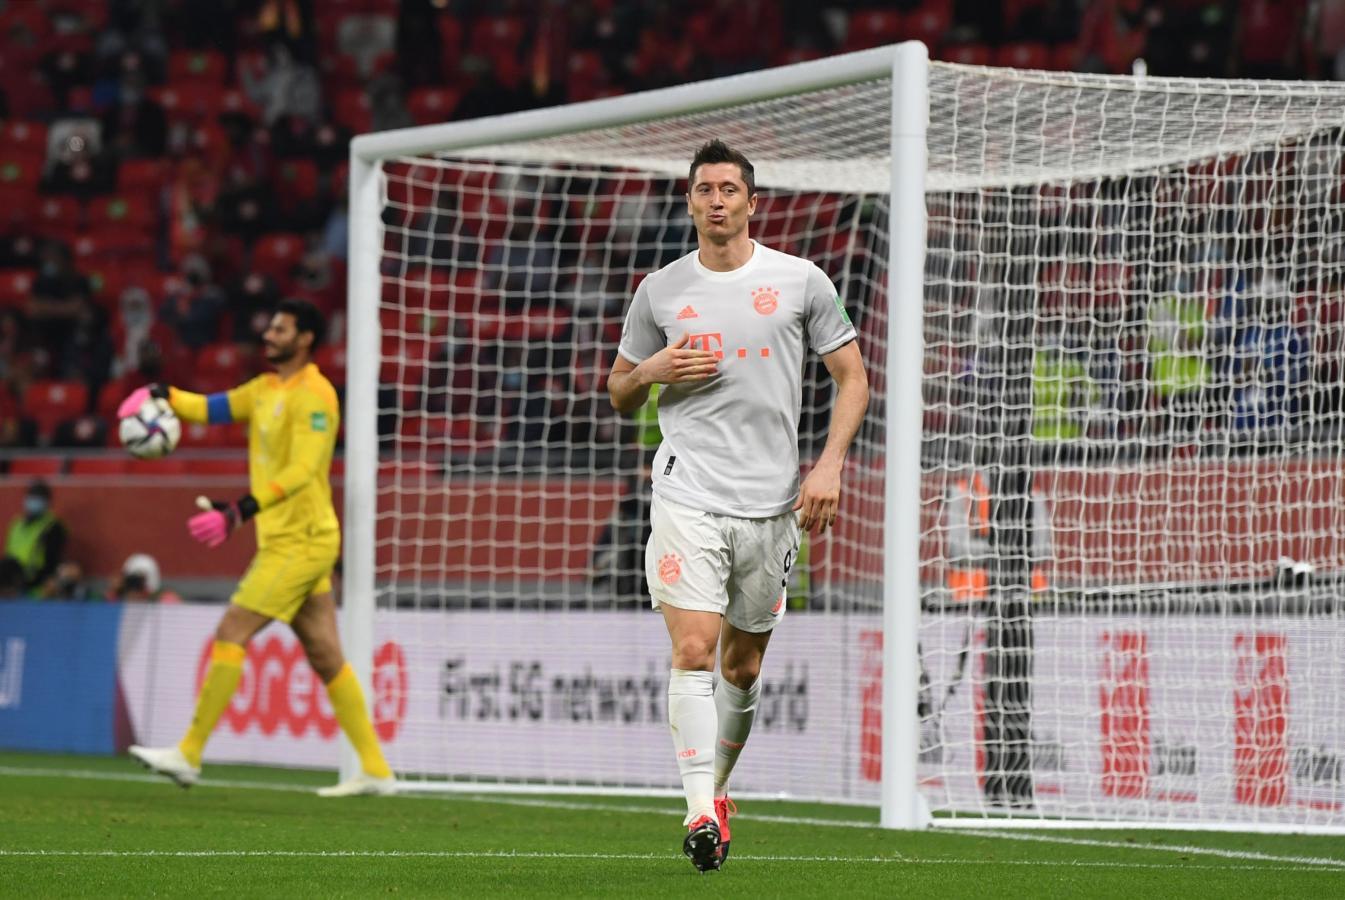 Lewandowski suma 275 goles en 316 partidos en Bayern Münich